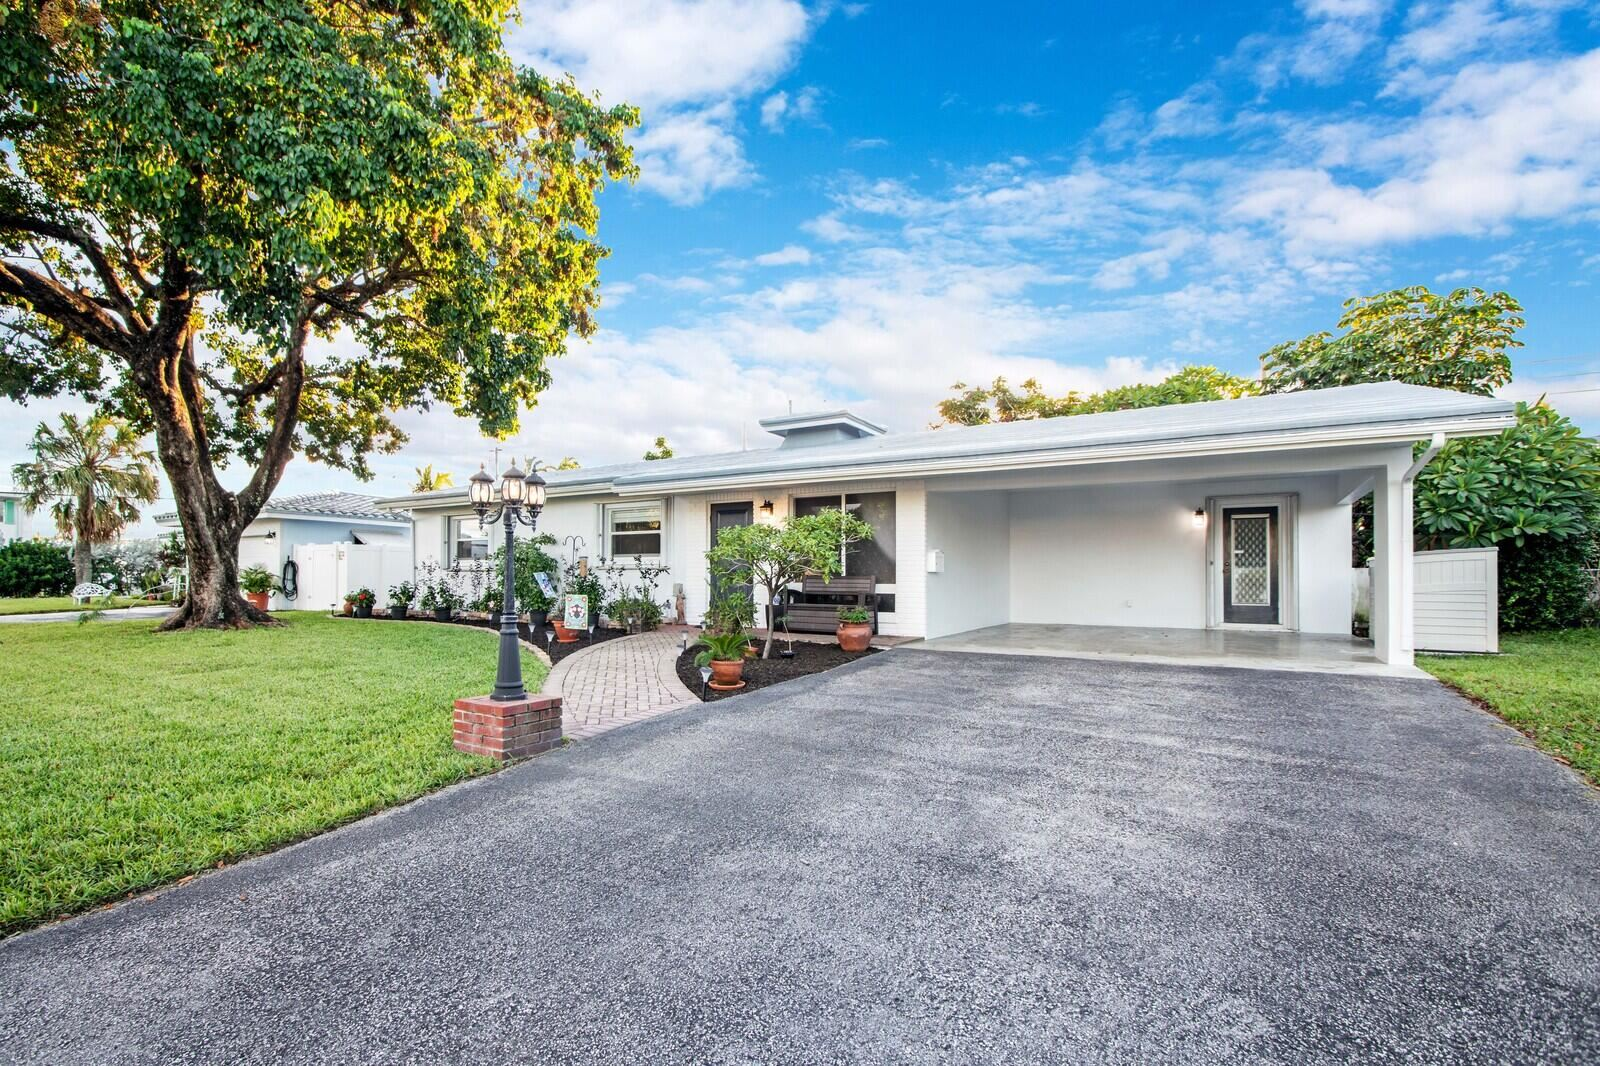 Photo of 6405 NE 18th Terrace, Fort Lauderdale, FL 33308 (MLS # RX-10751934)